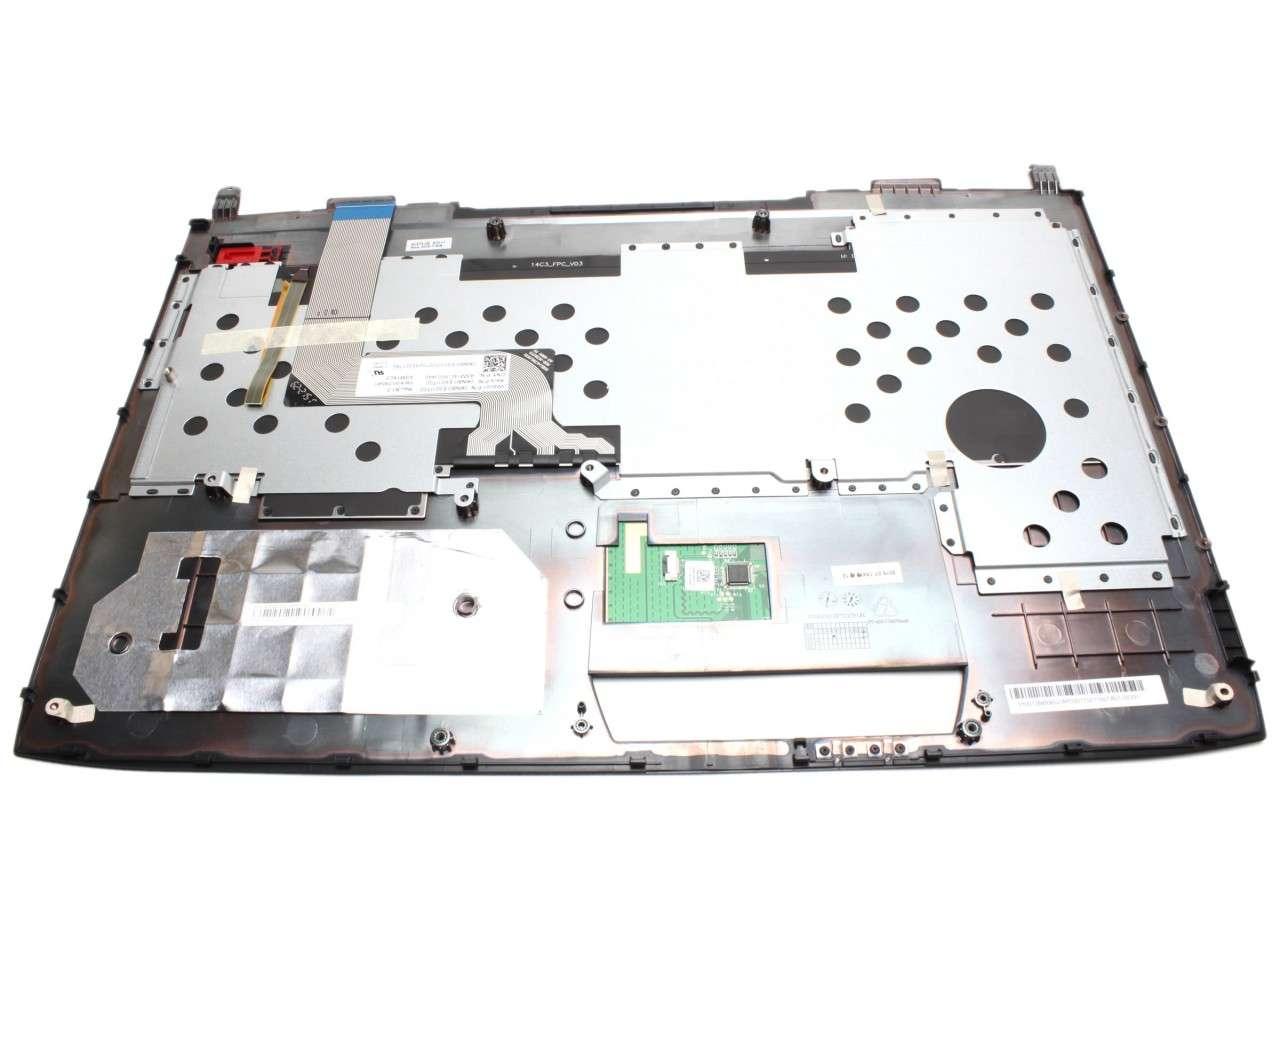 Tastatura Asus 90NB06G1-R30300 neagra cu Palmrest negru iluminata backlit imagine